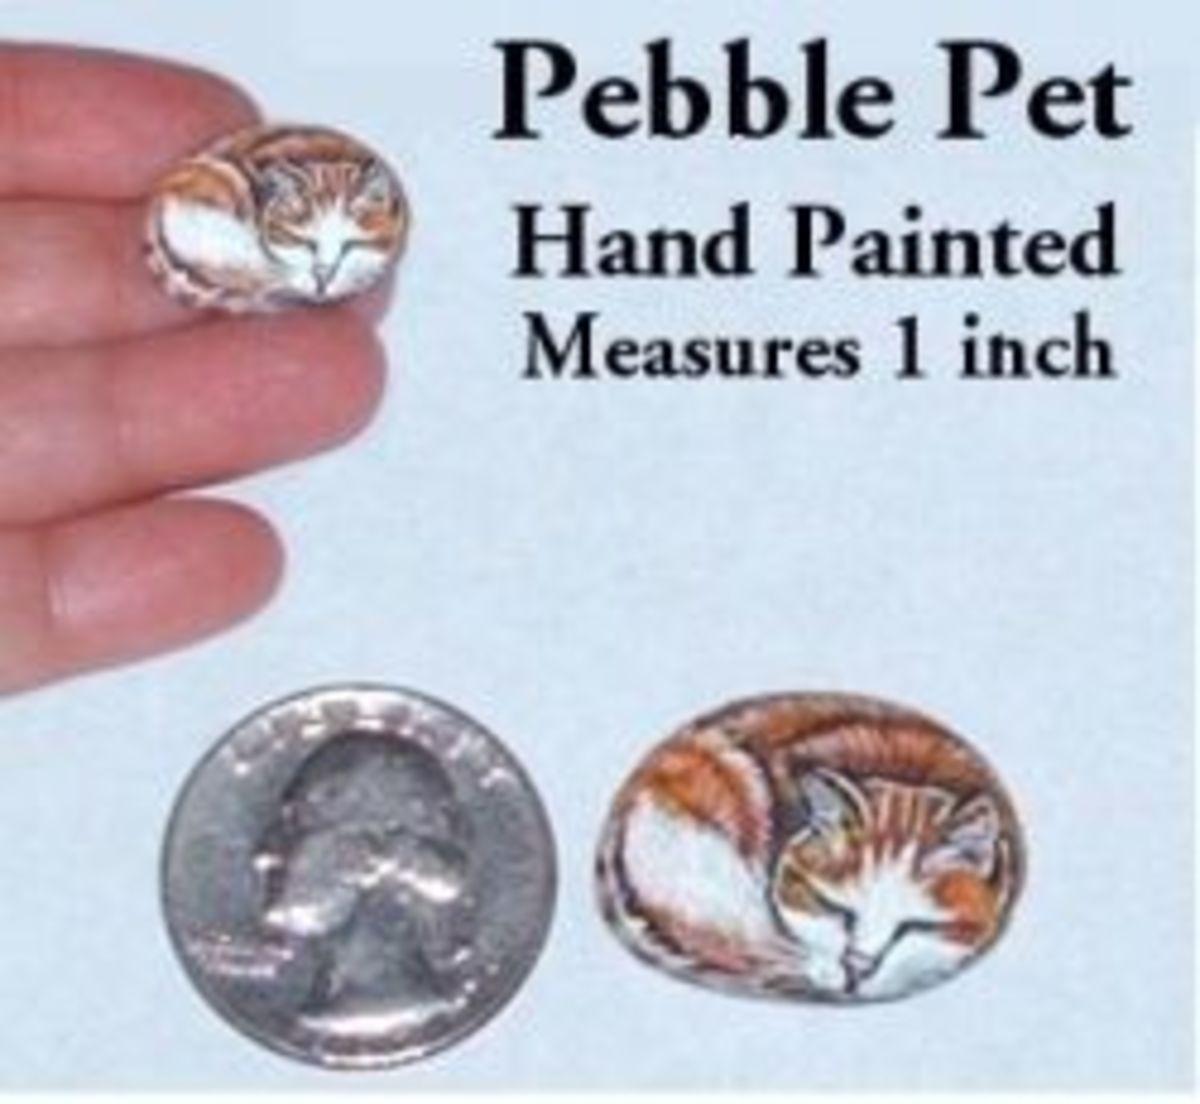 Lisa Carter's tiny Pebble Pets